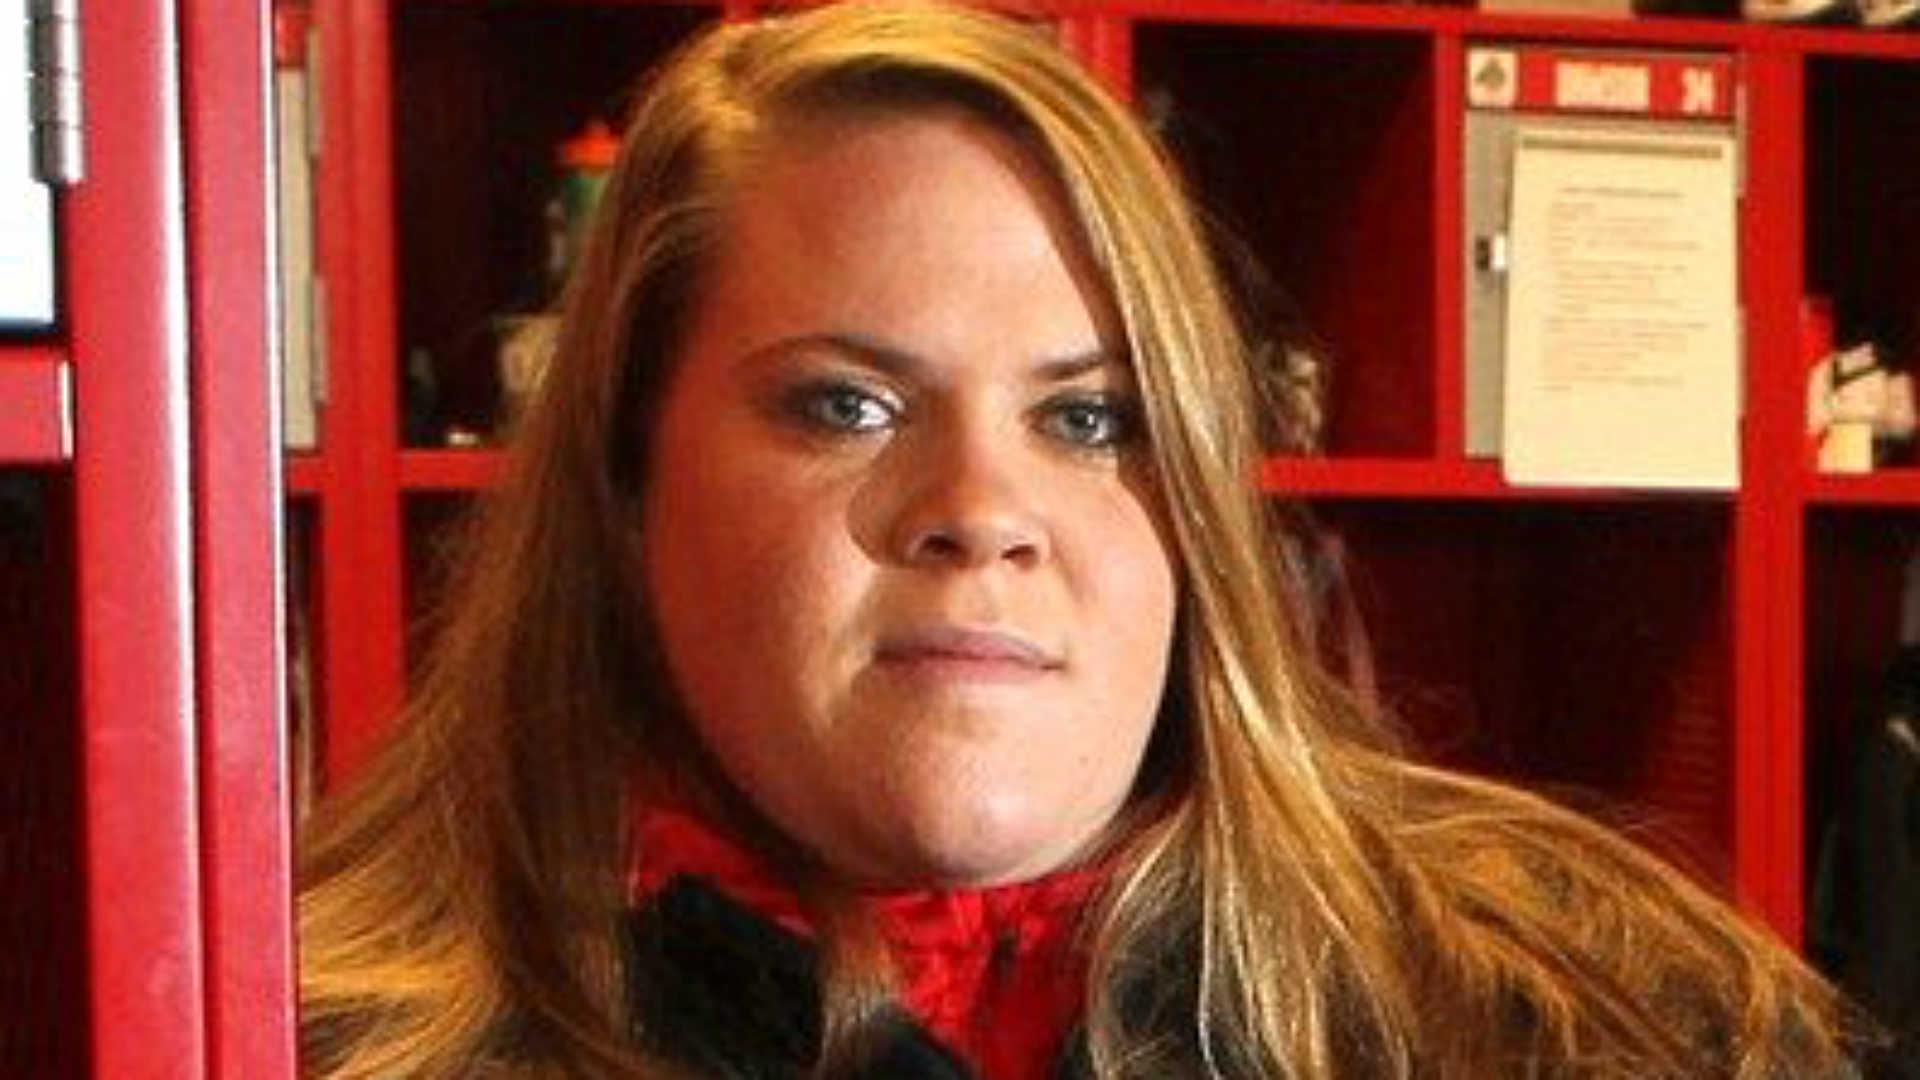 AmandaBelichick-071115-USNews-FTR